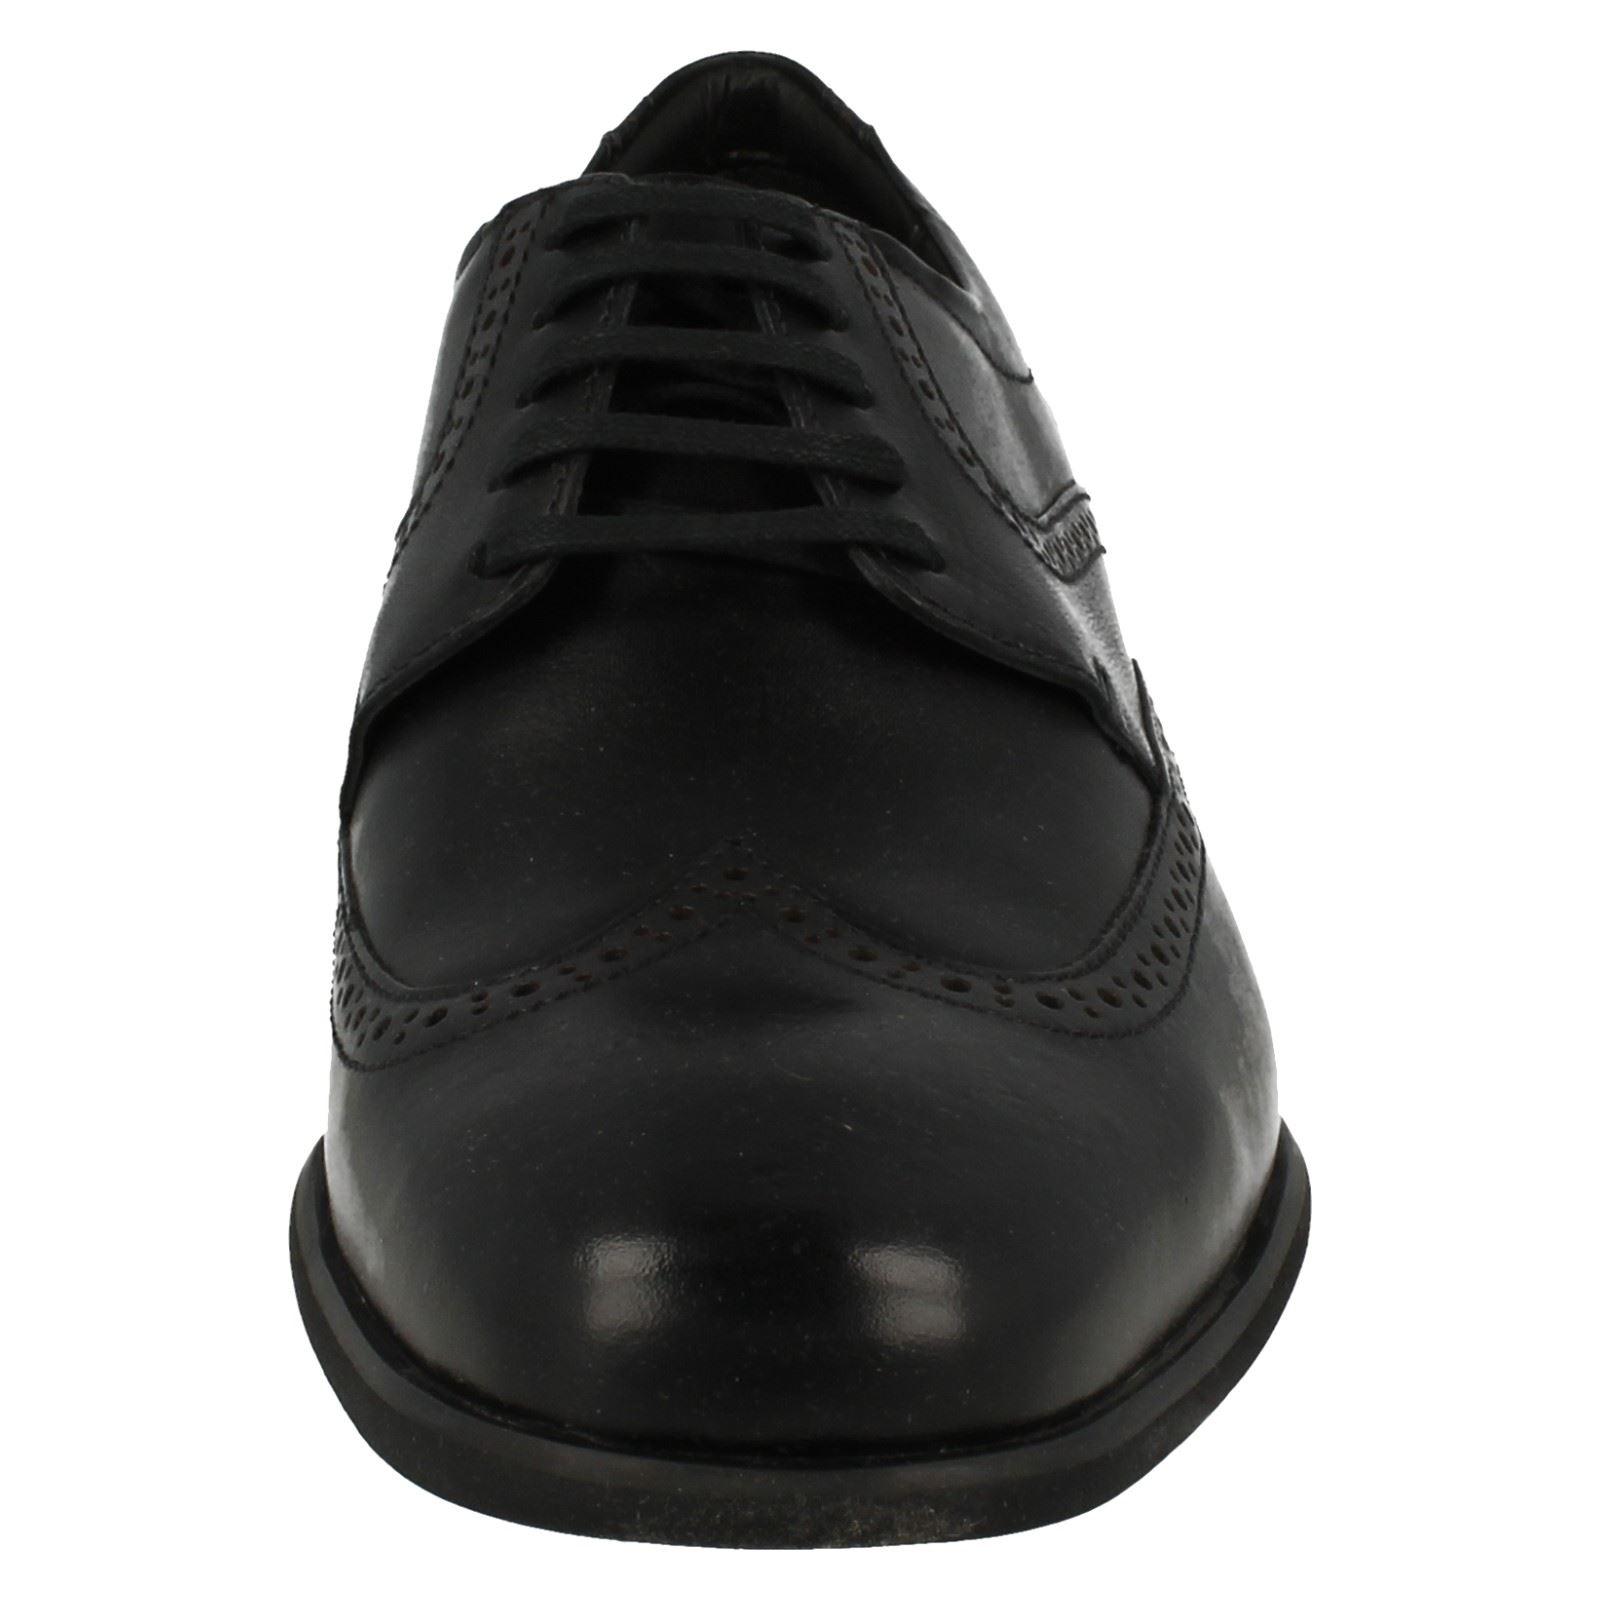 Mens Anatomic Smart Formal Shoes Panapolis